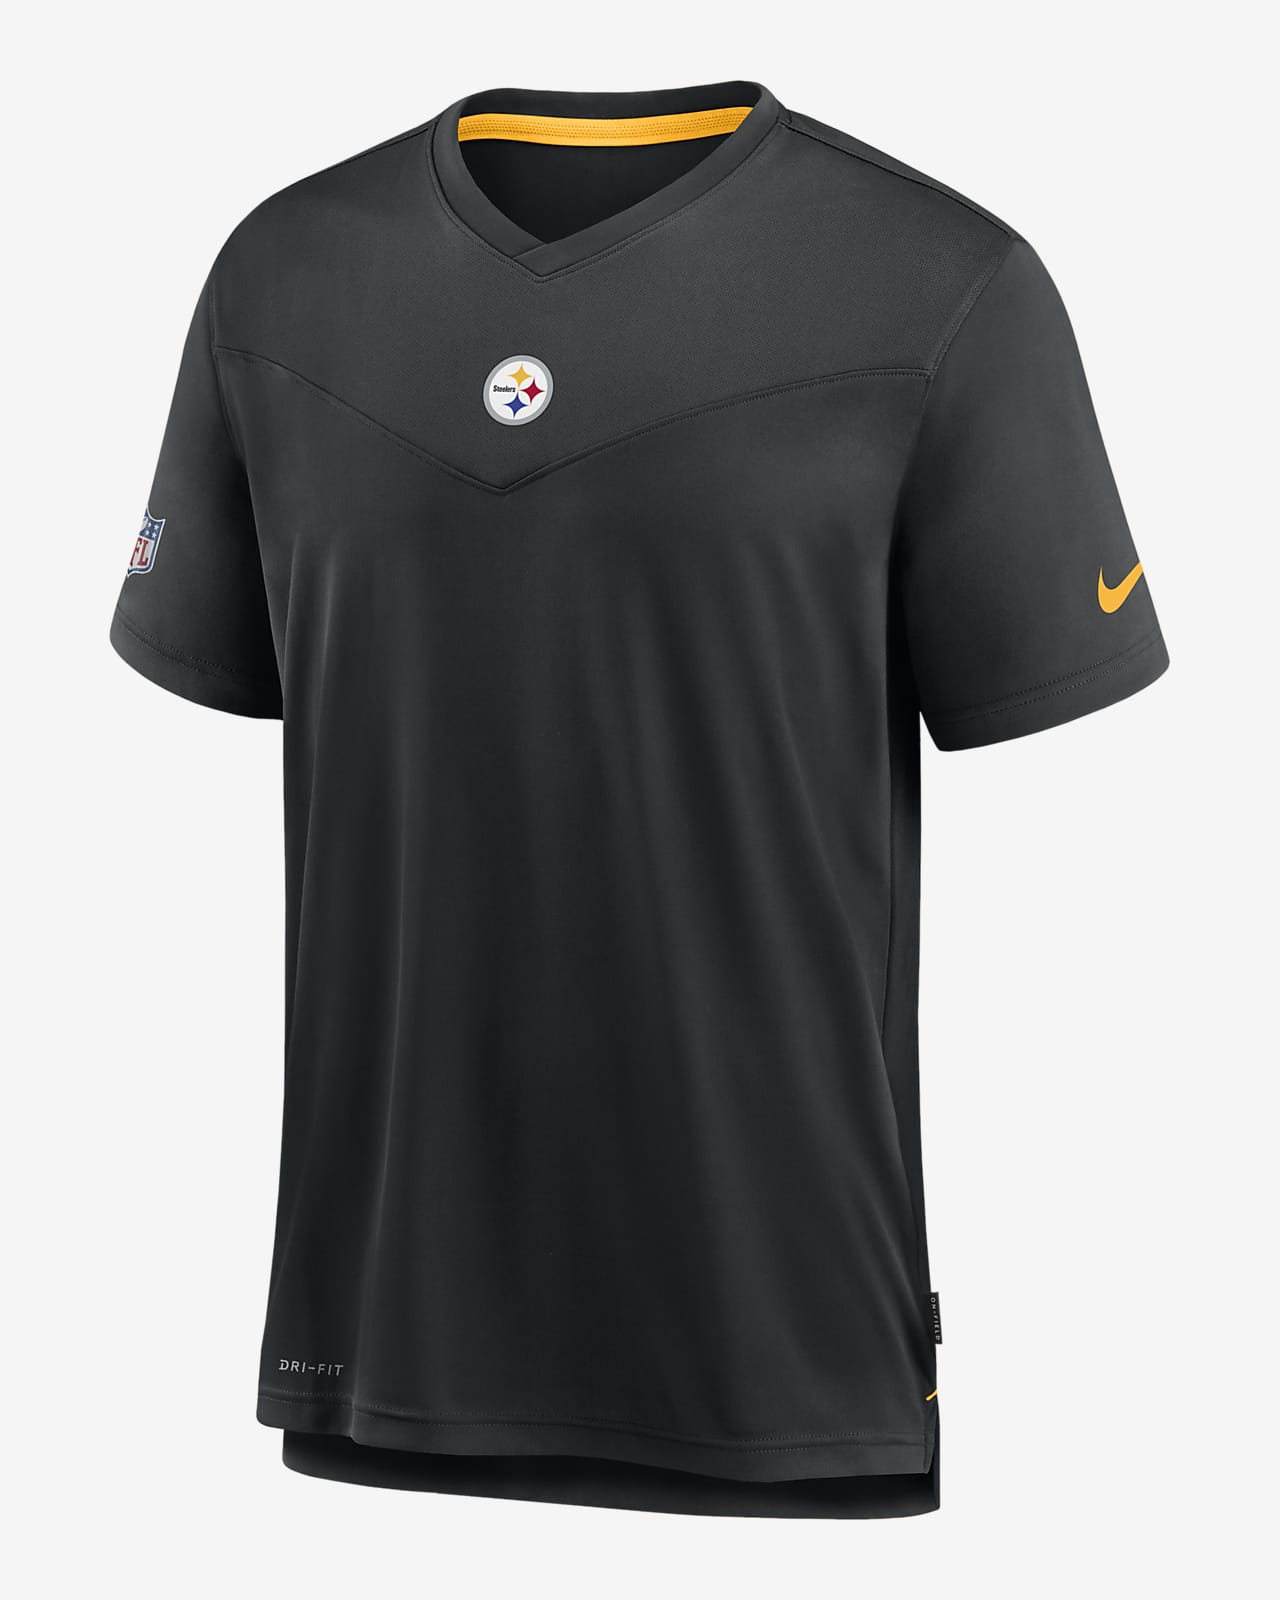 Nike Dri-FIT Sideline Coaches (NFL Pittsburgh Steelers) Men's V-Neck T-Shirt